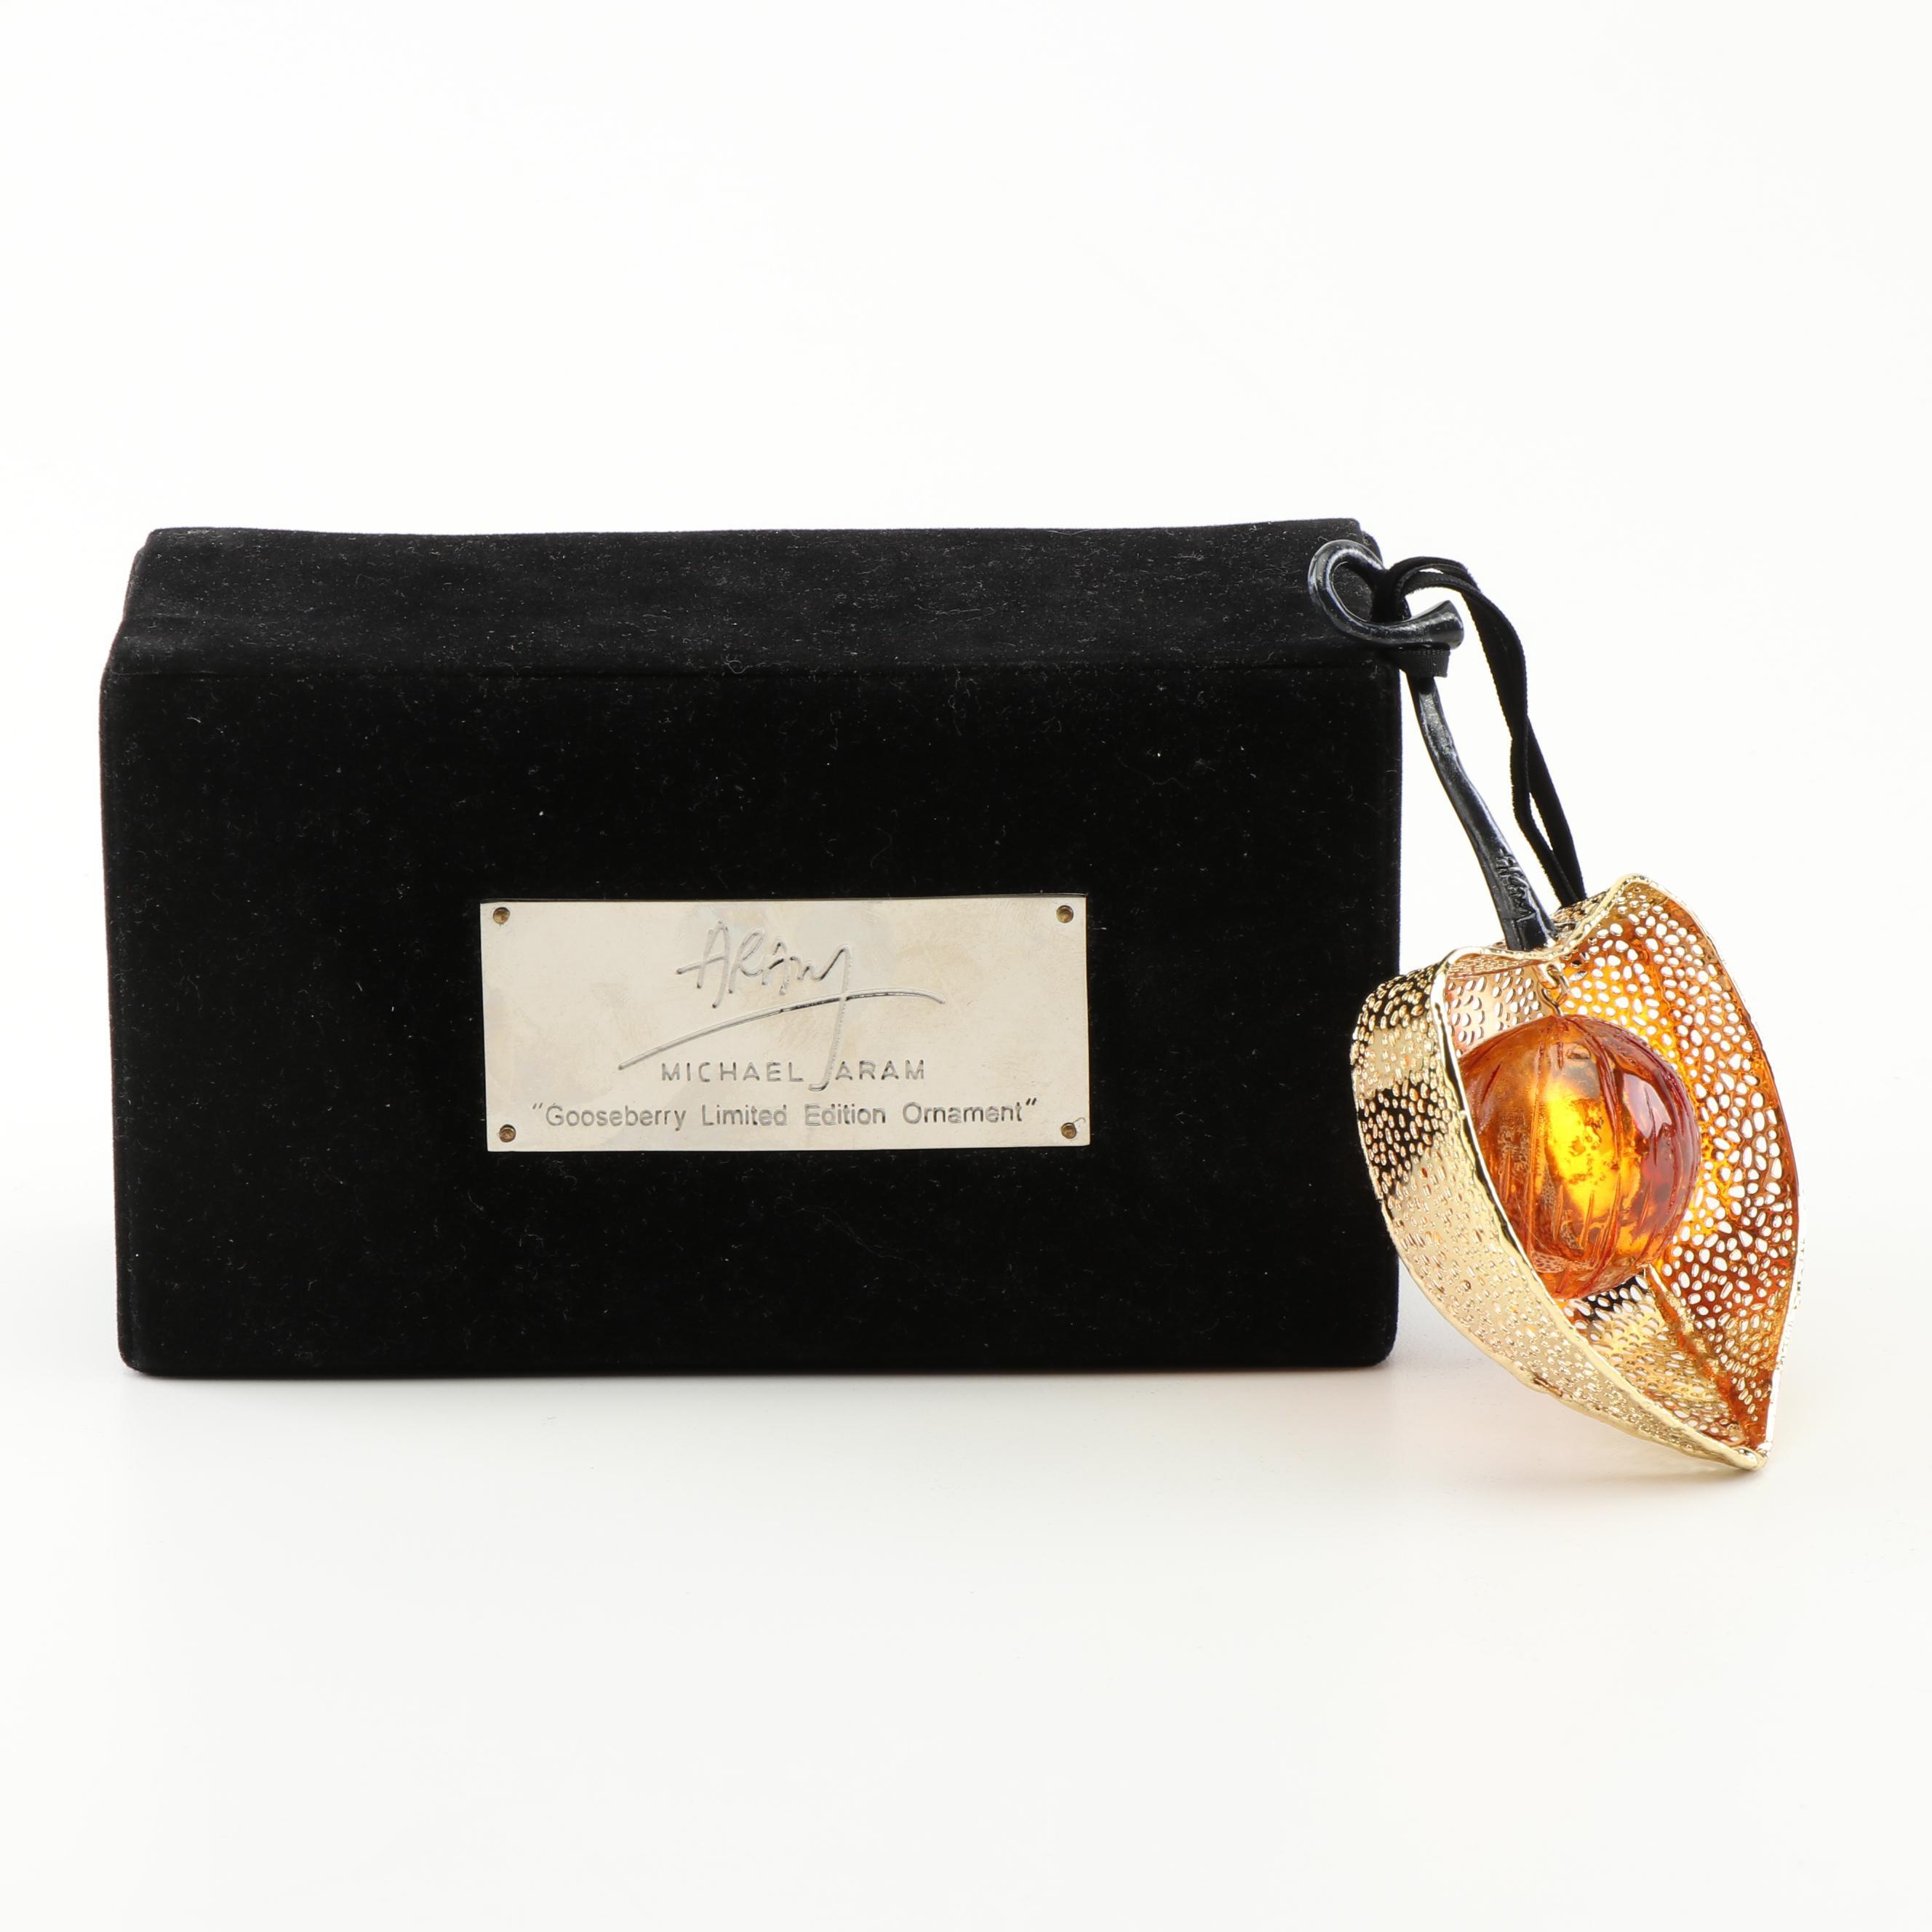 Michael Aram Gooseberry Limited Edition Ornament